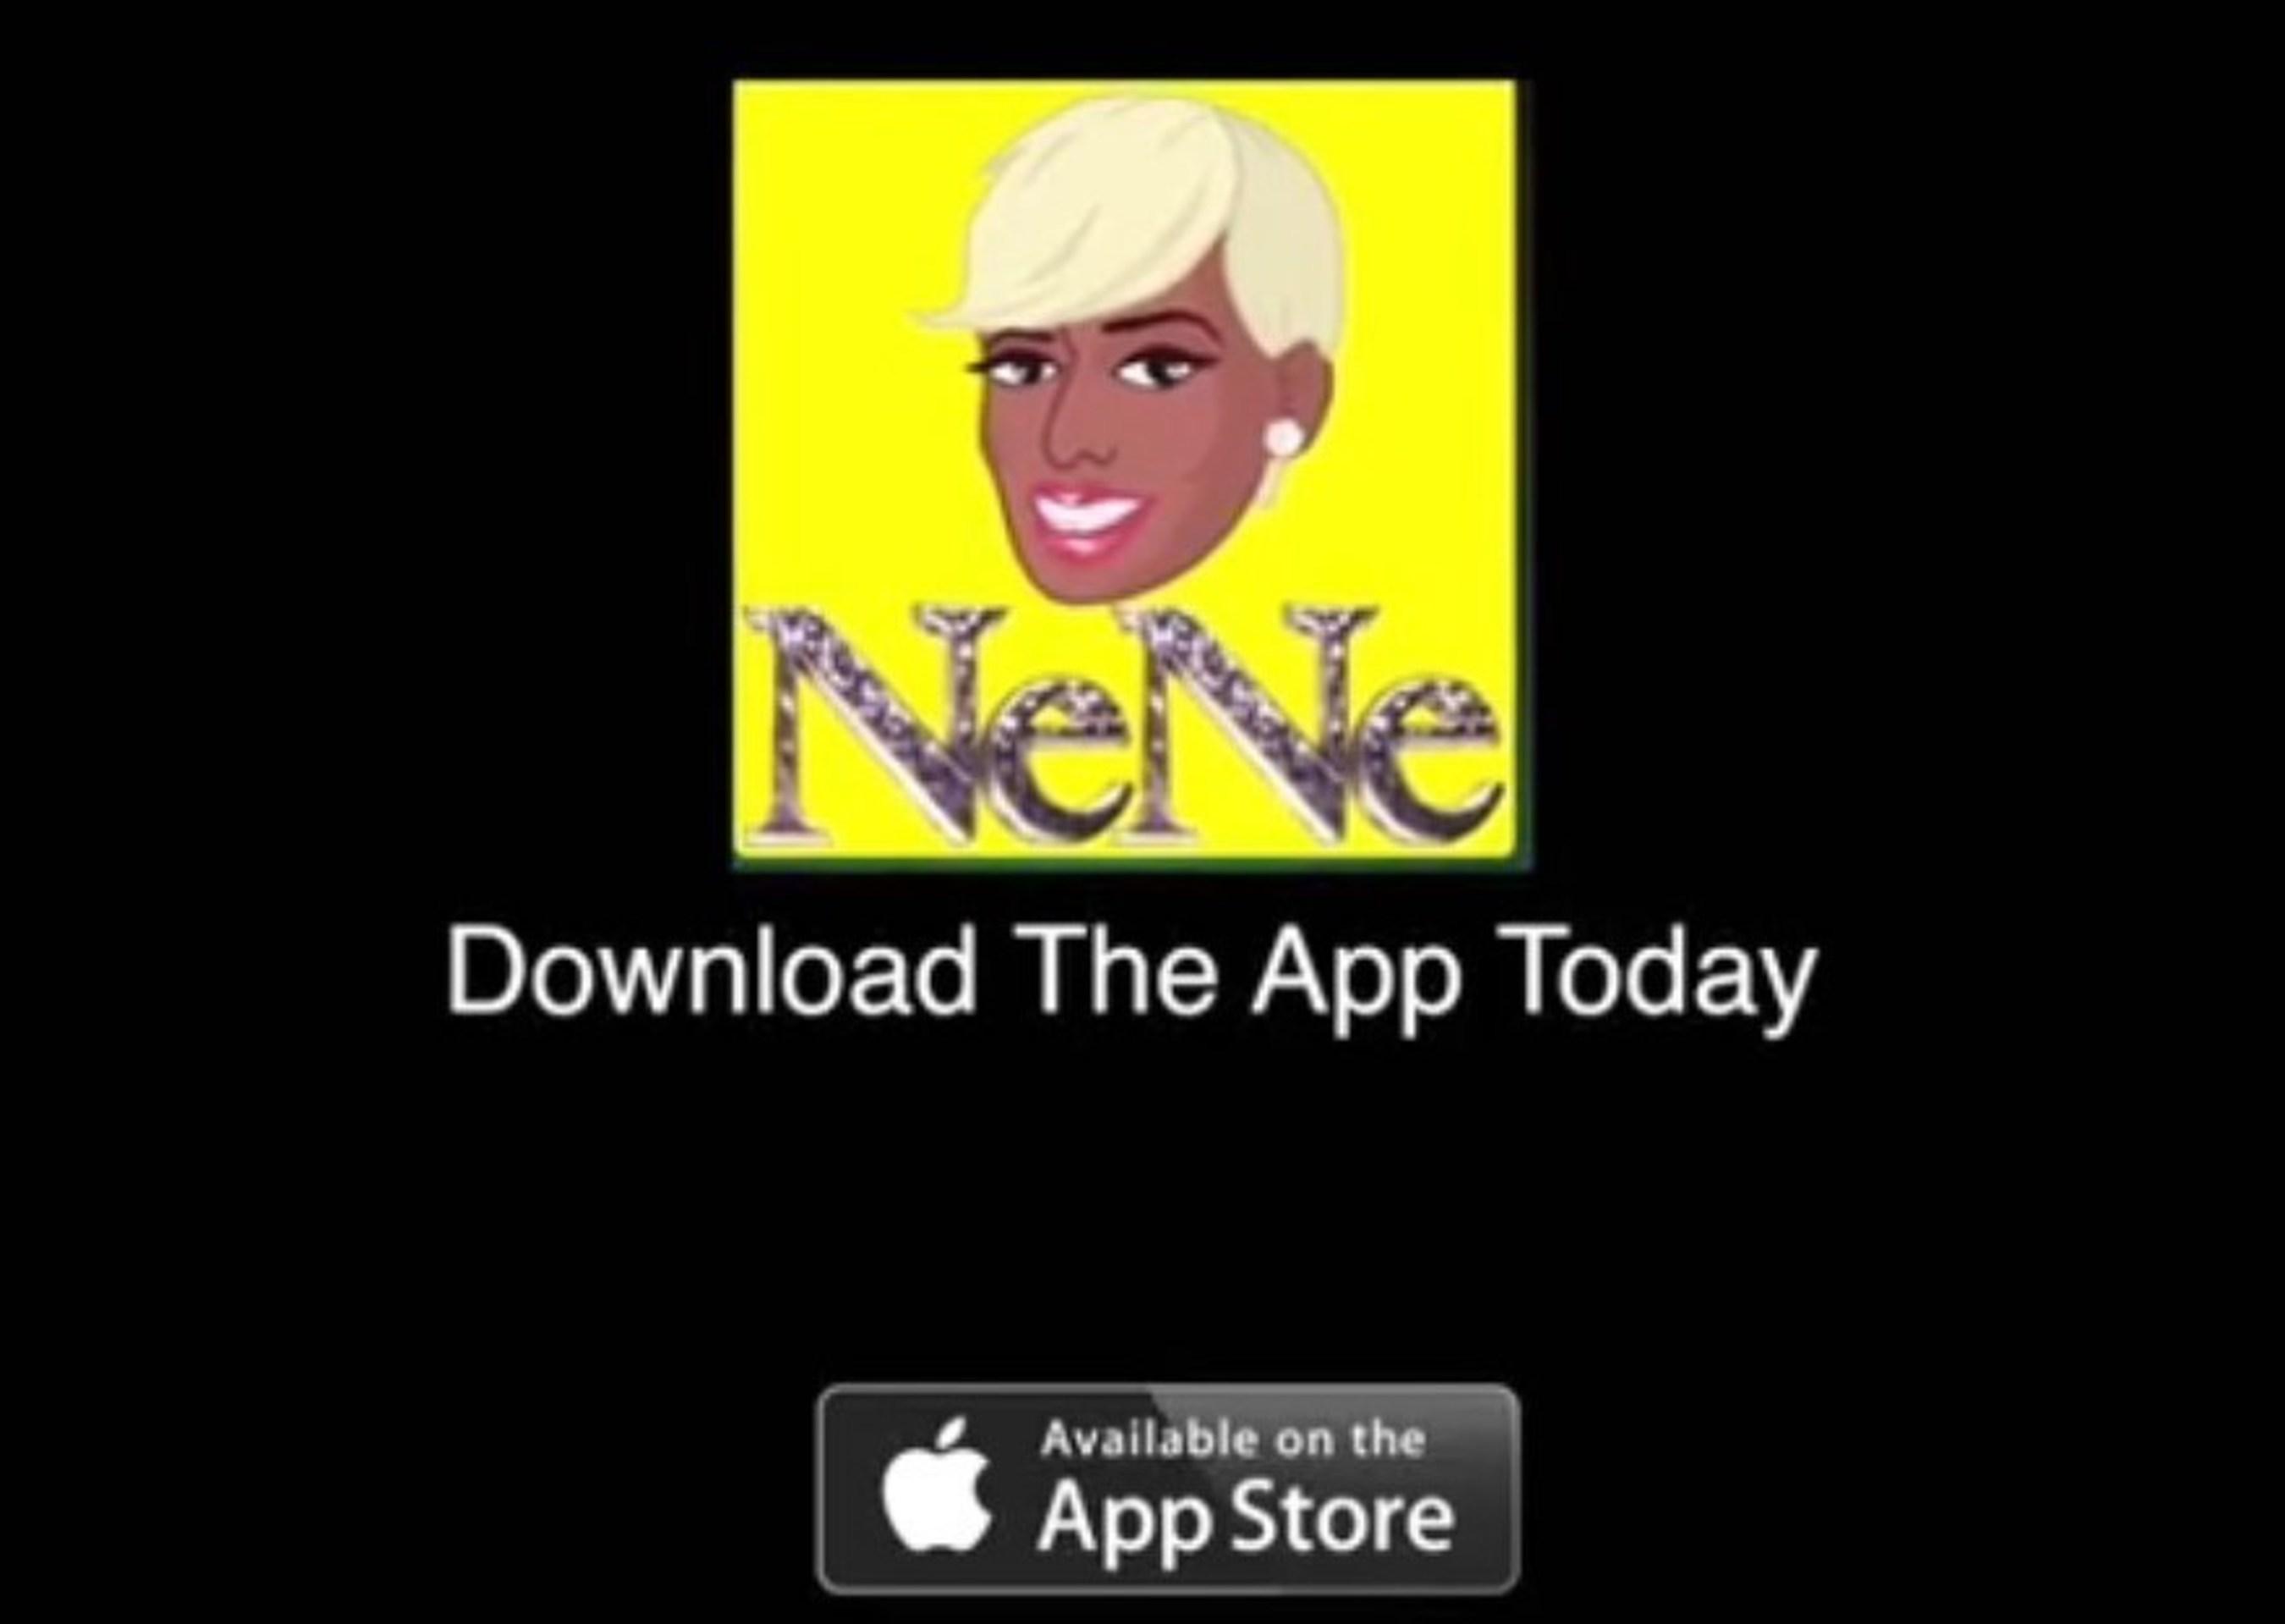 NeNe Leakes Launches a New iOS App